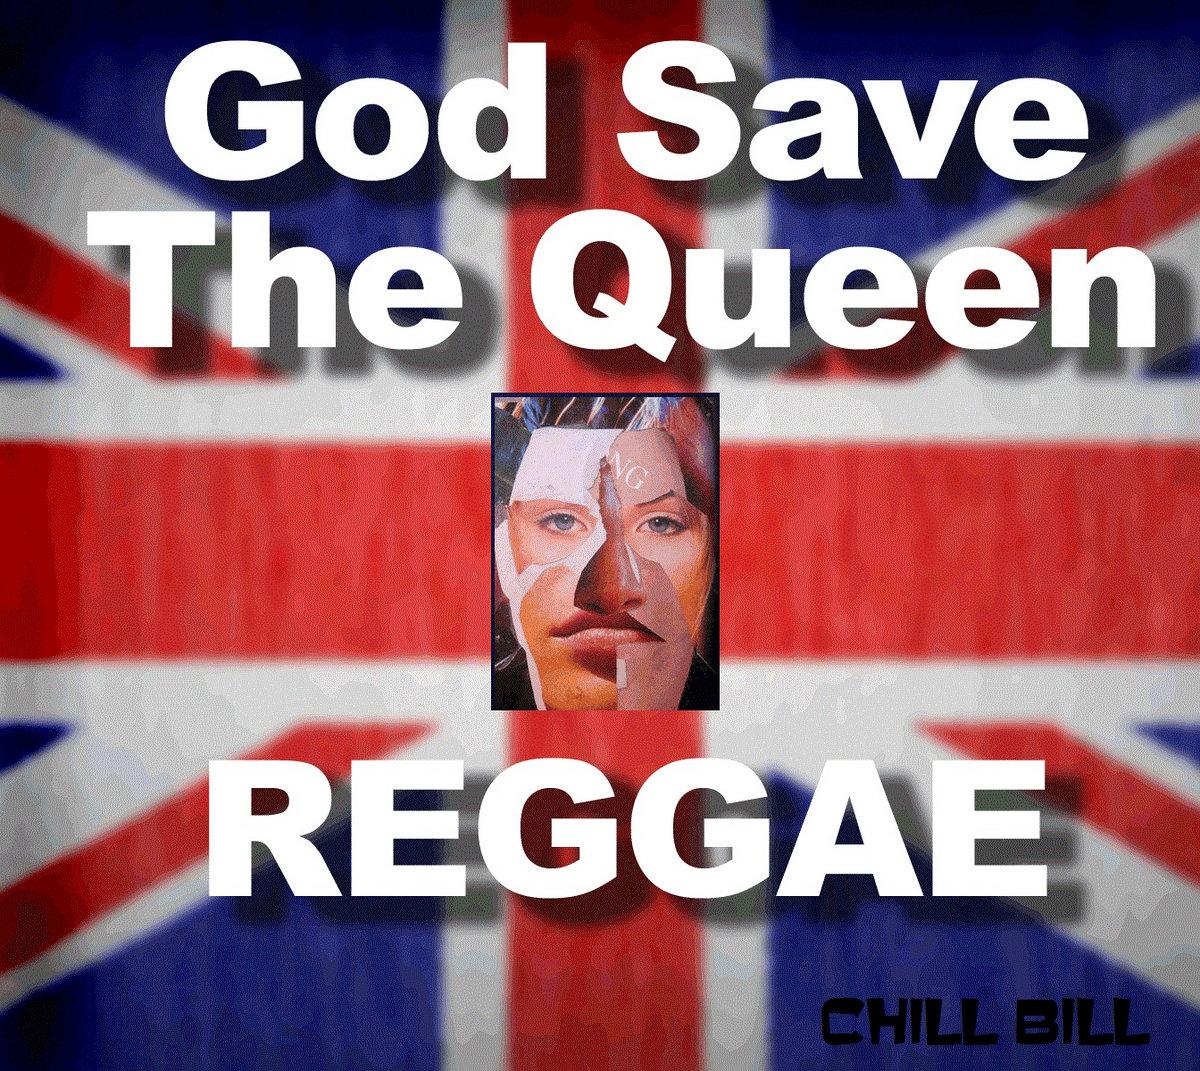 god save the queen reggae chill bill. Black Bedroom Furniture Sets. Home Design Ideas